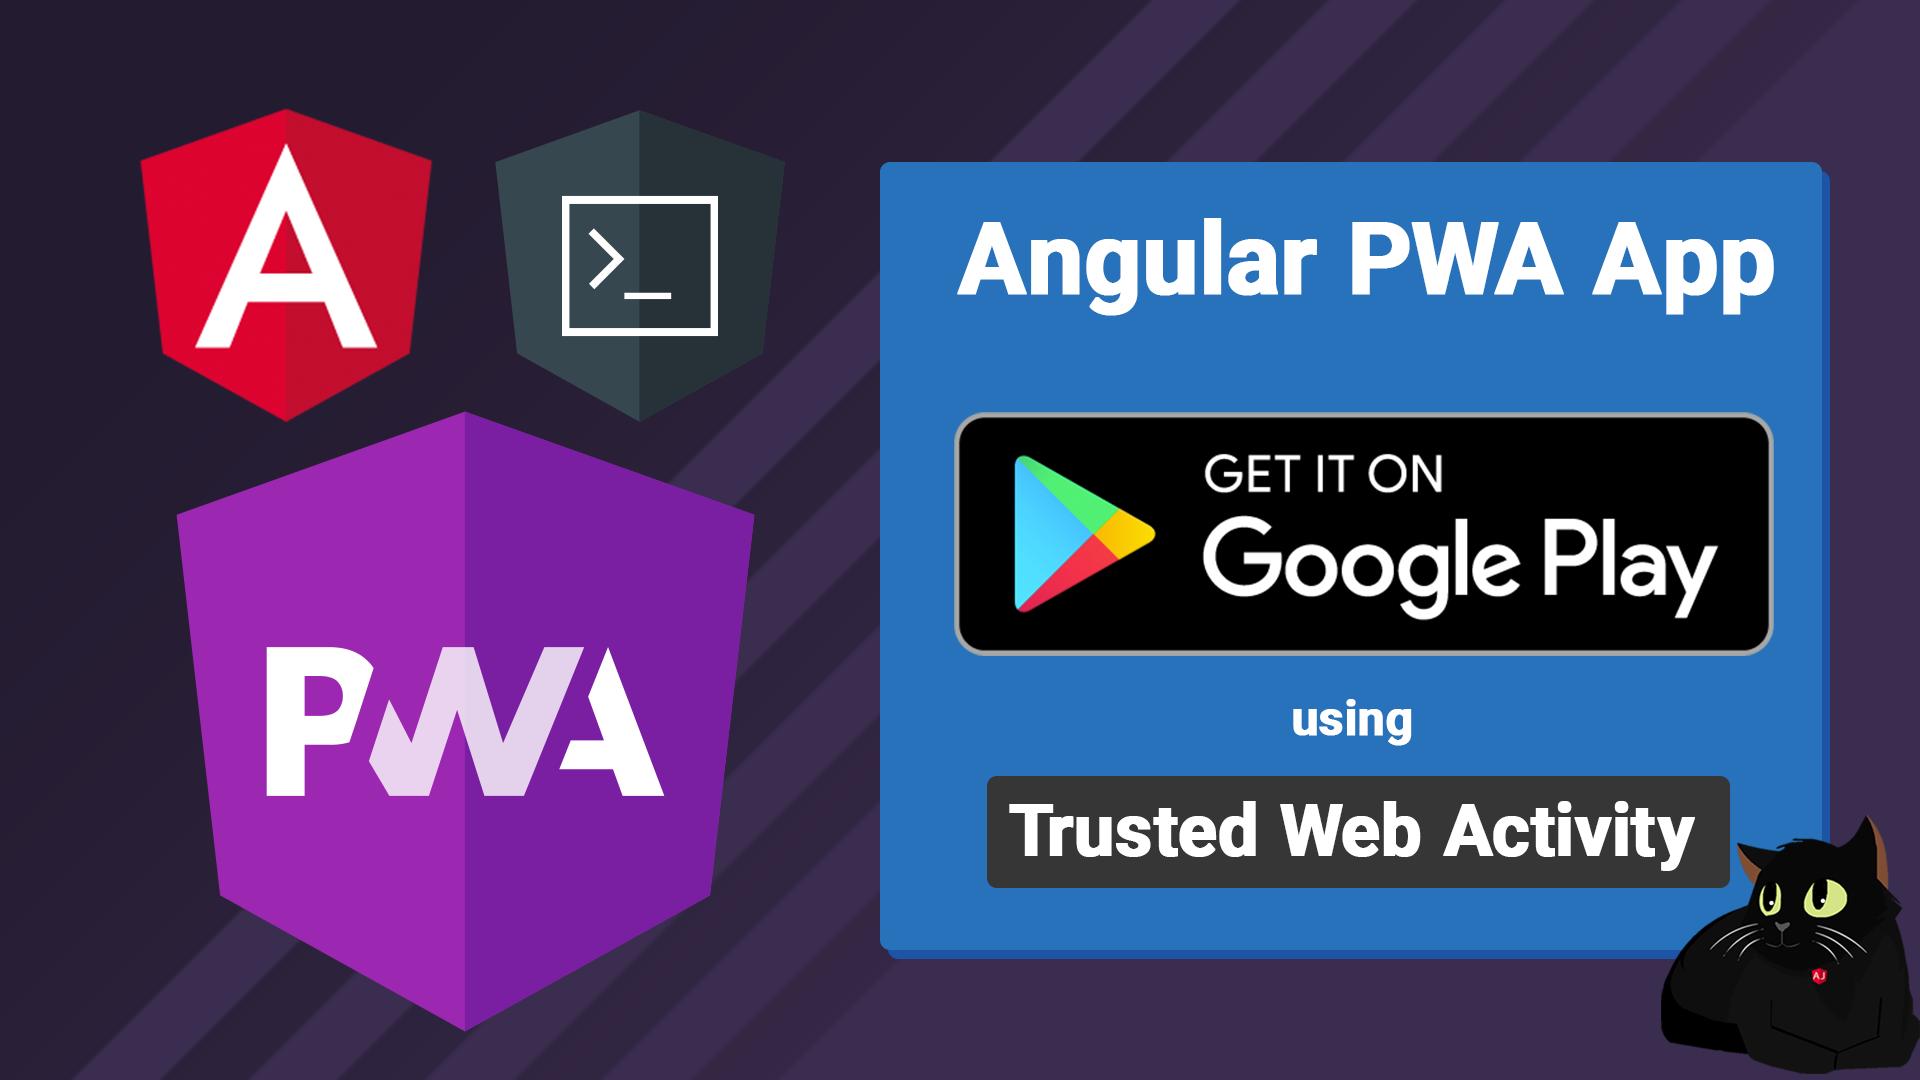 Angular PWA to Google Play store, using Trusted Web Activity